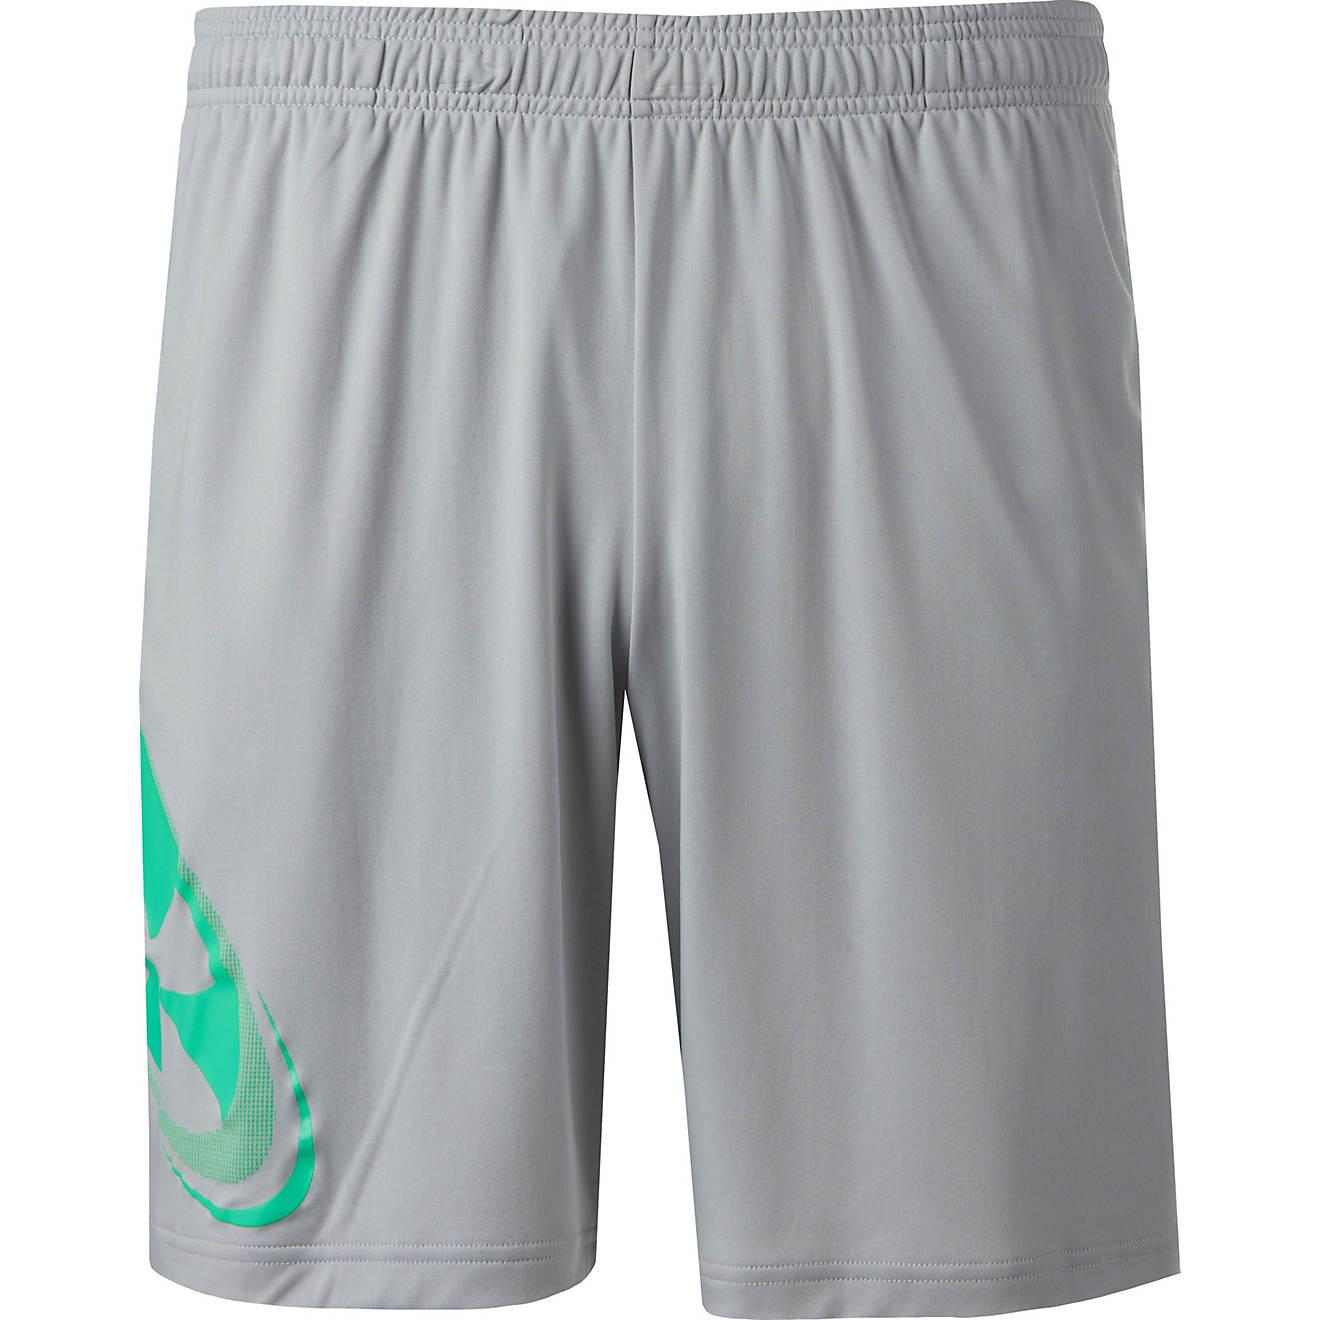 Under Armour Men's 10 Inch Tech Cosmic Shorts